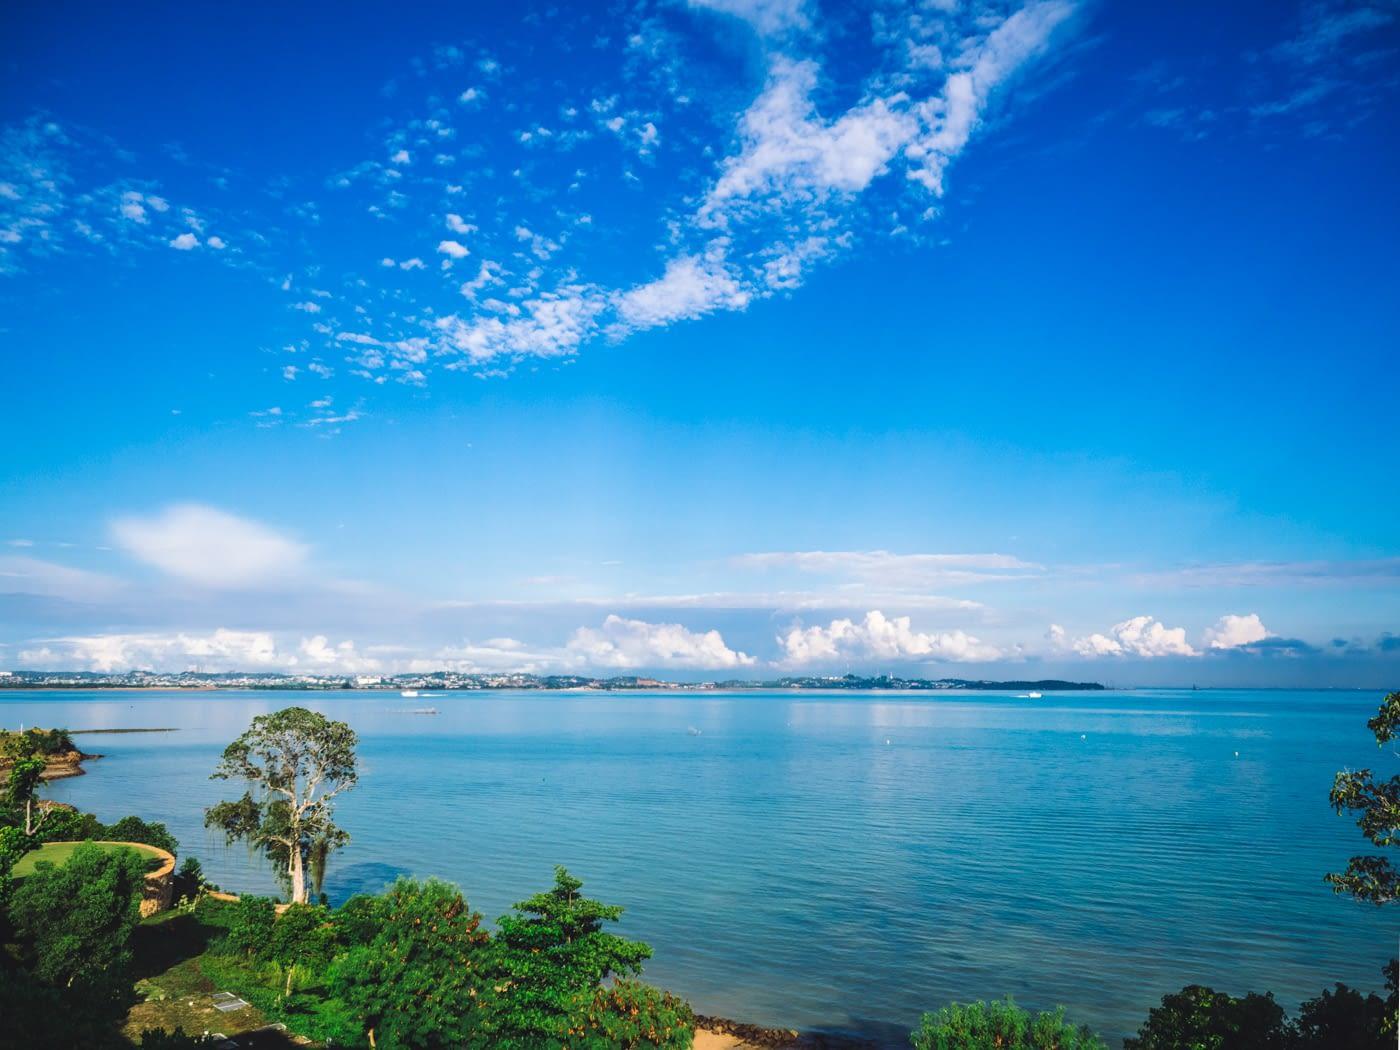 Indonesia - Montigo - Blue skies & water